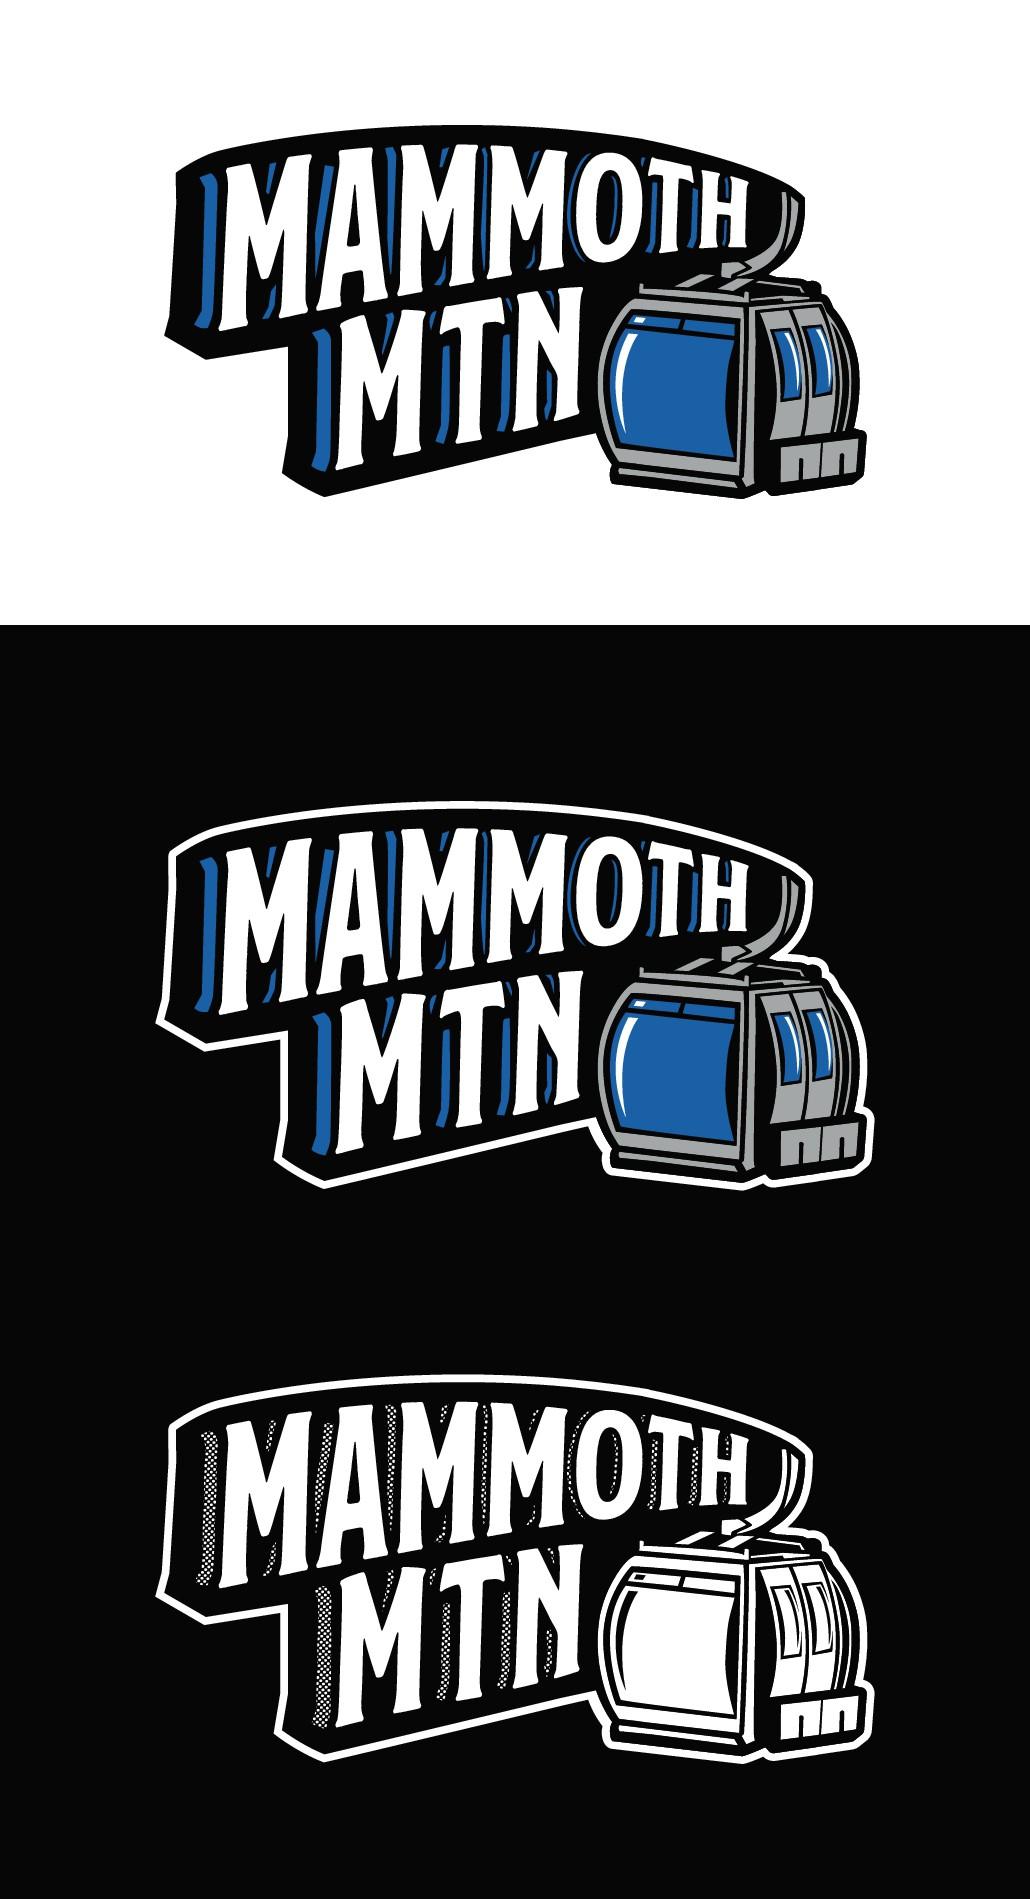 MAMMOTH MTN